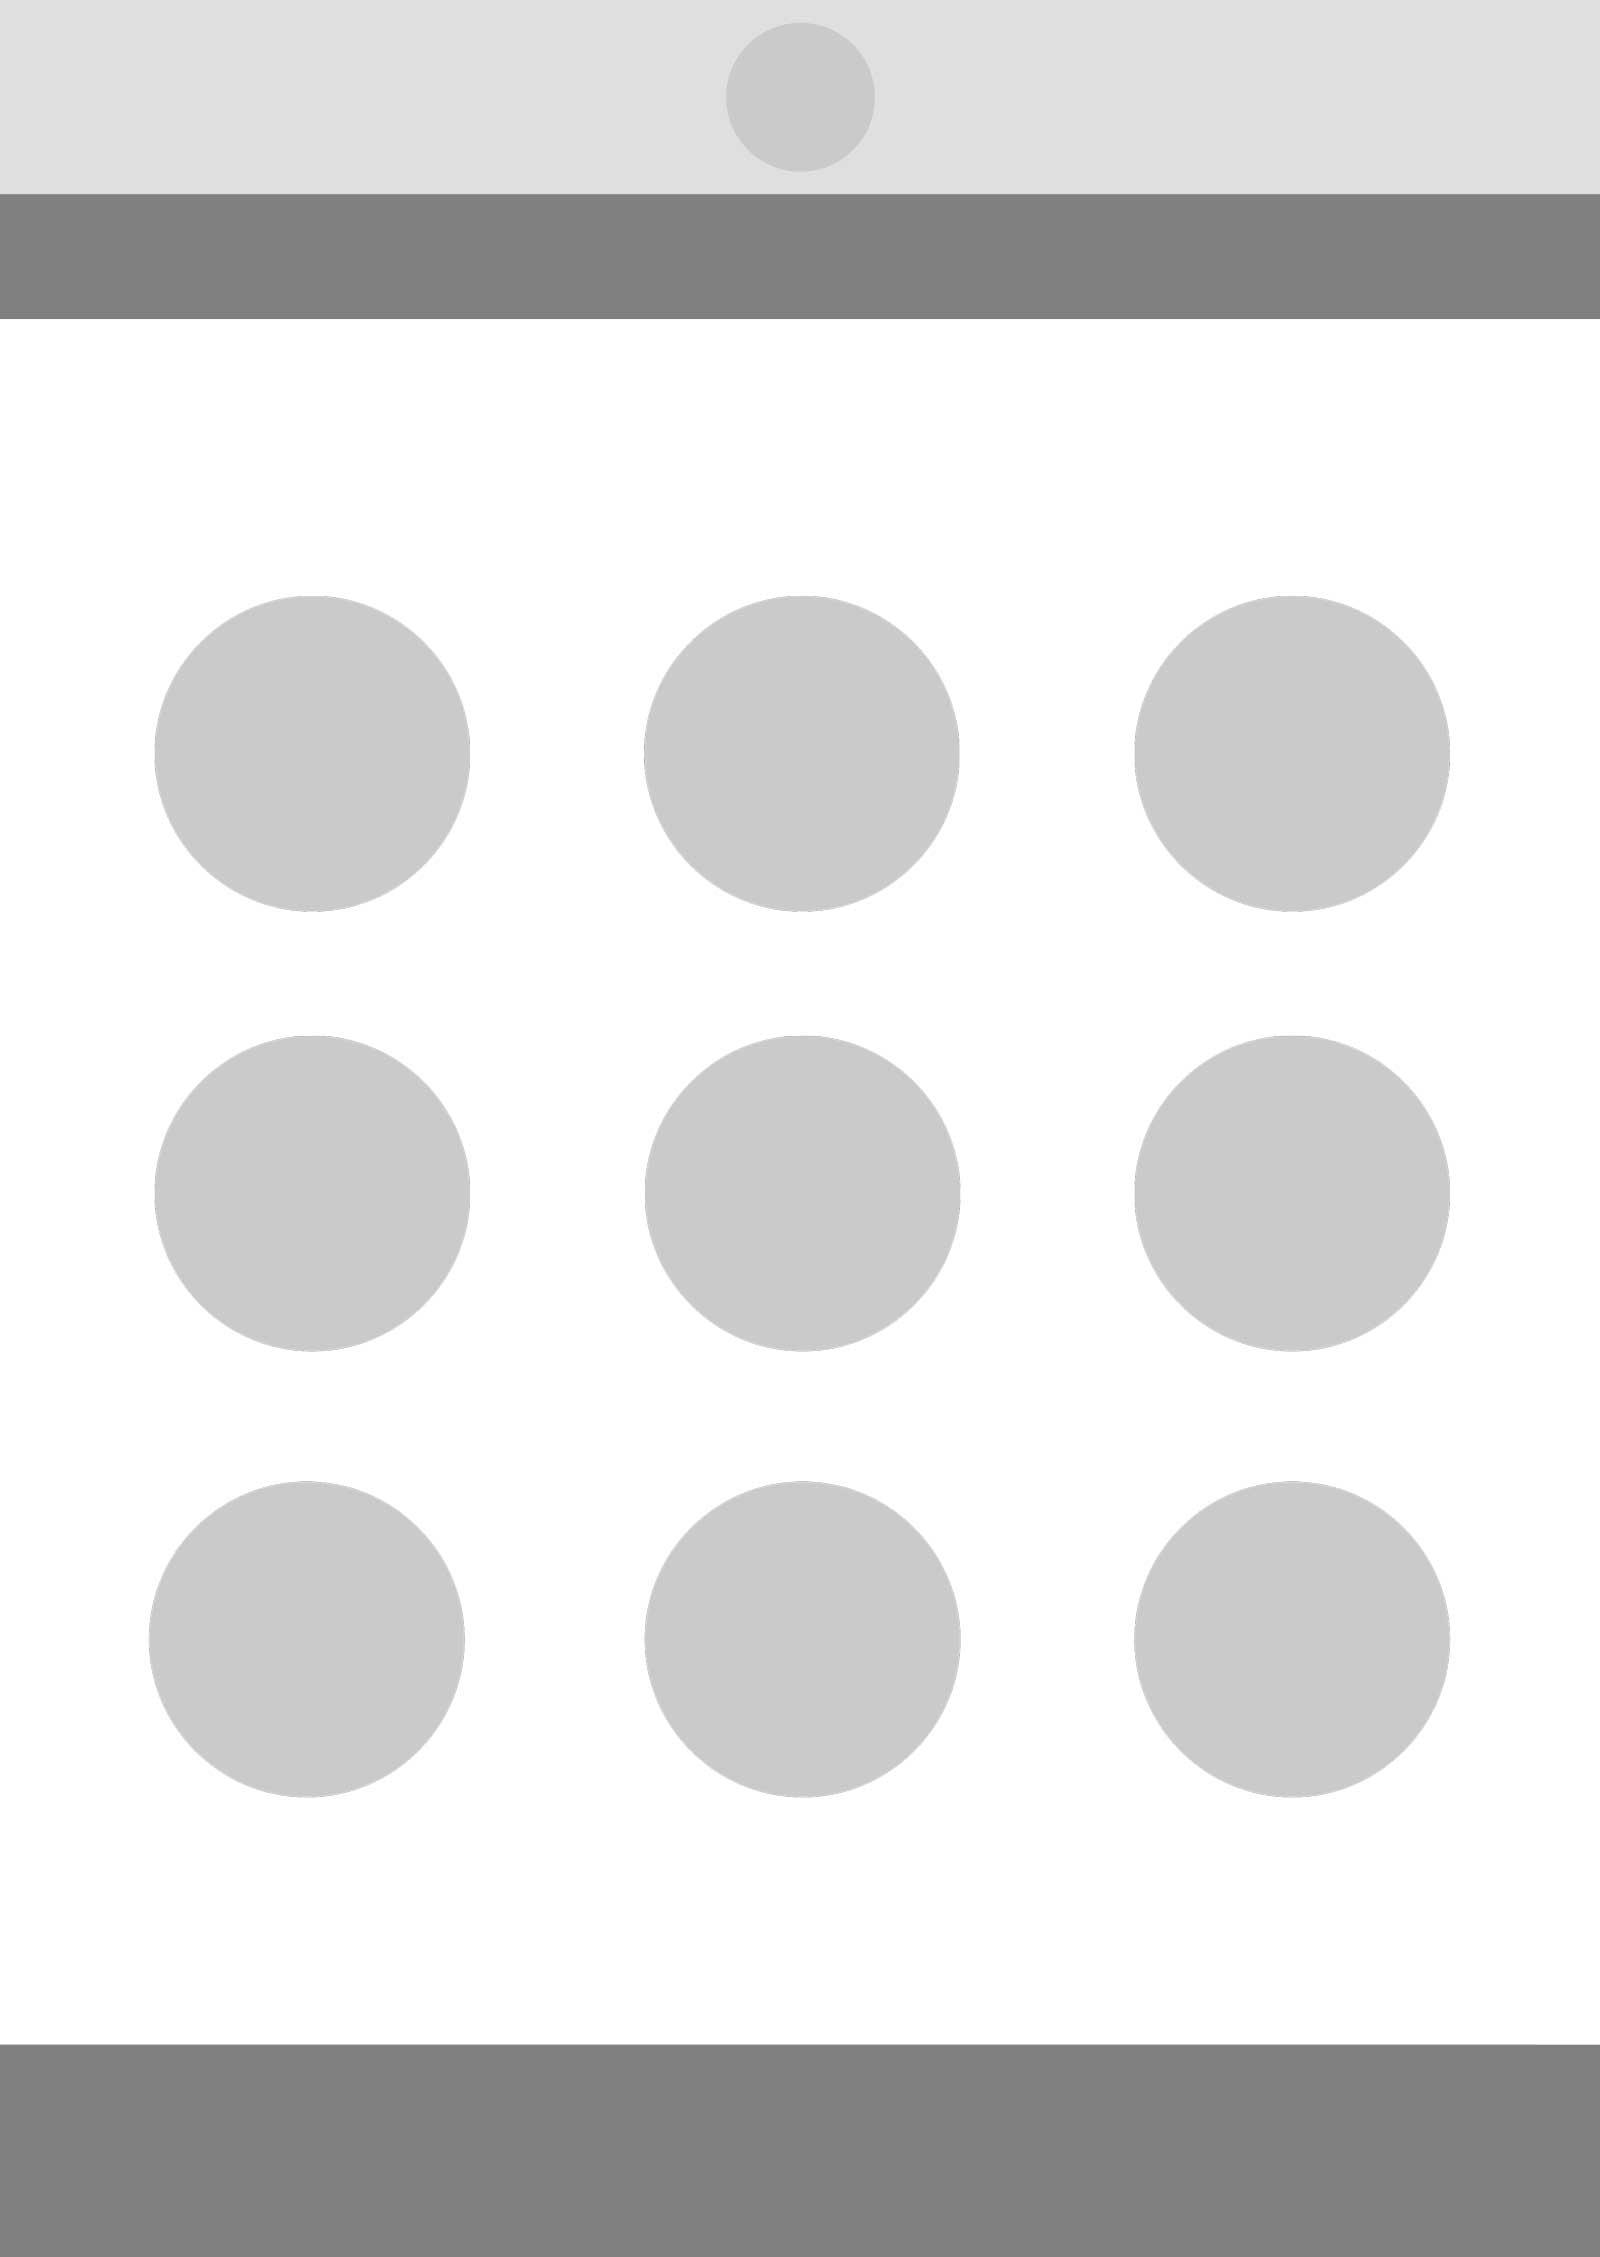 wireframestemplate-2.jpg